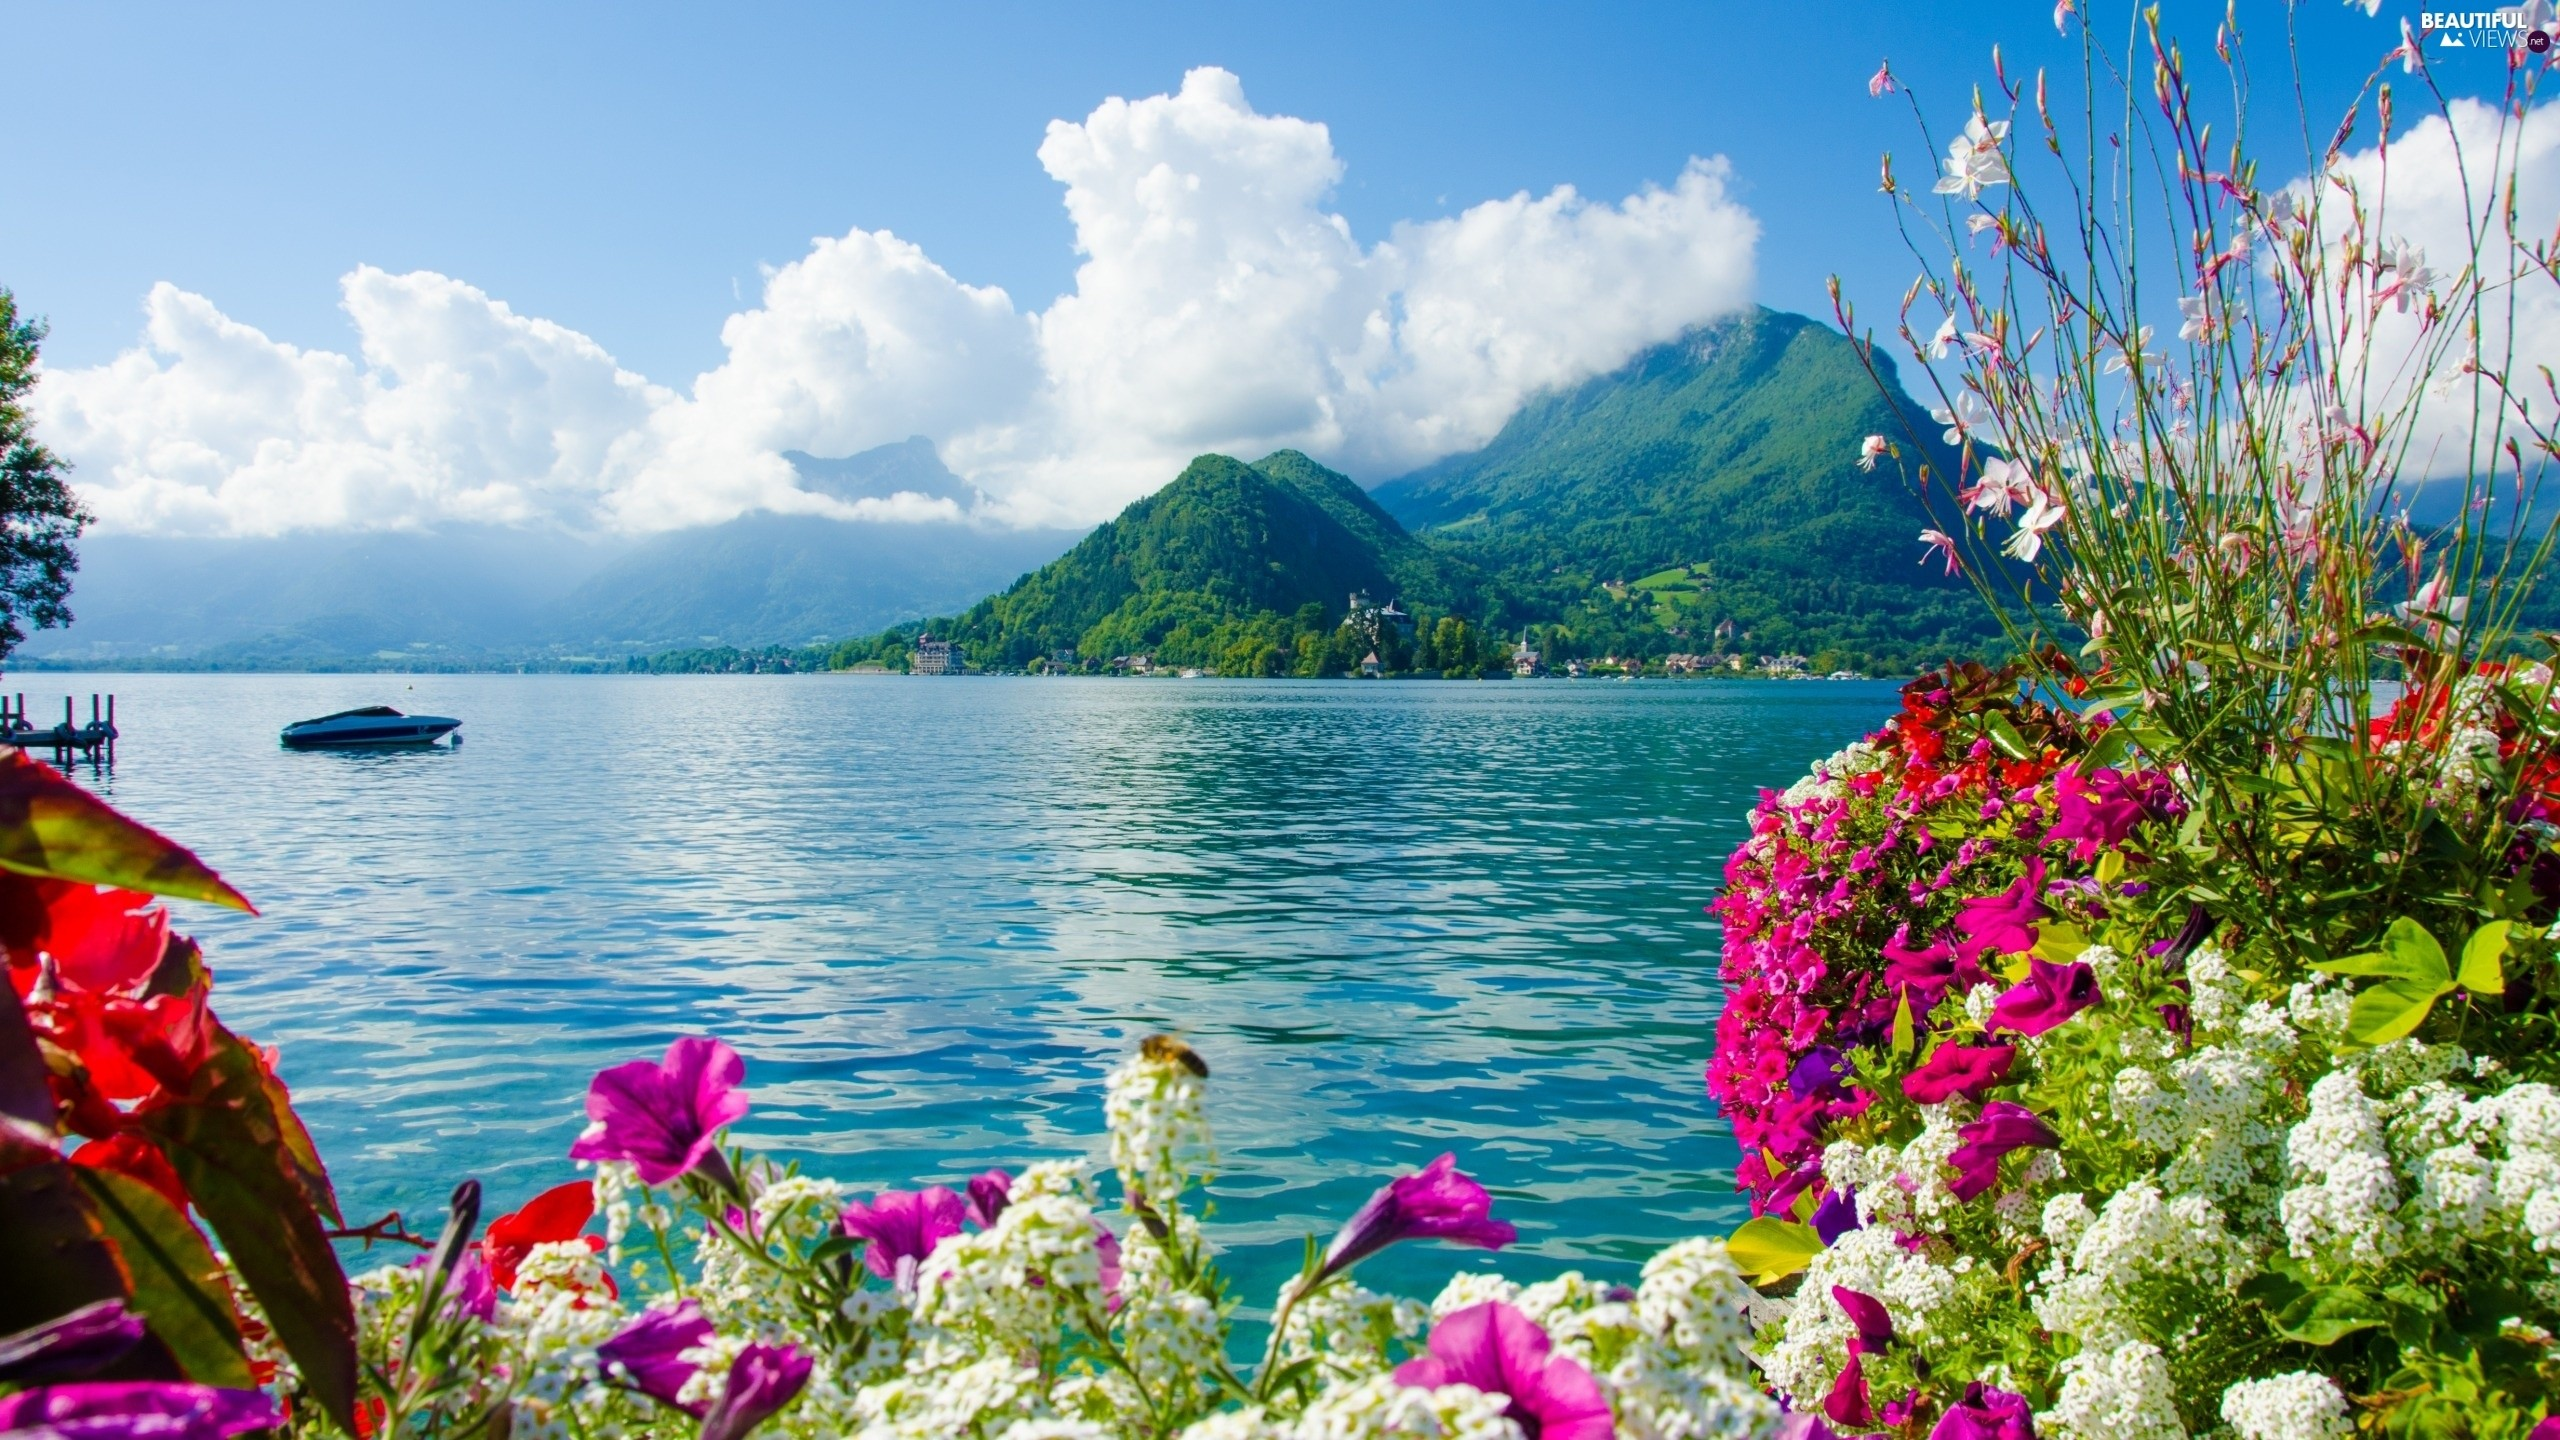 beautiful views wallpaper (51+ images)